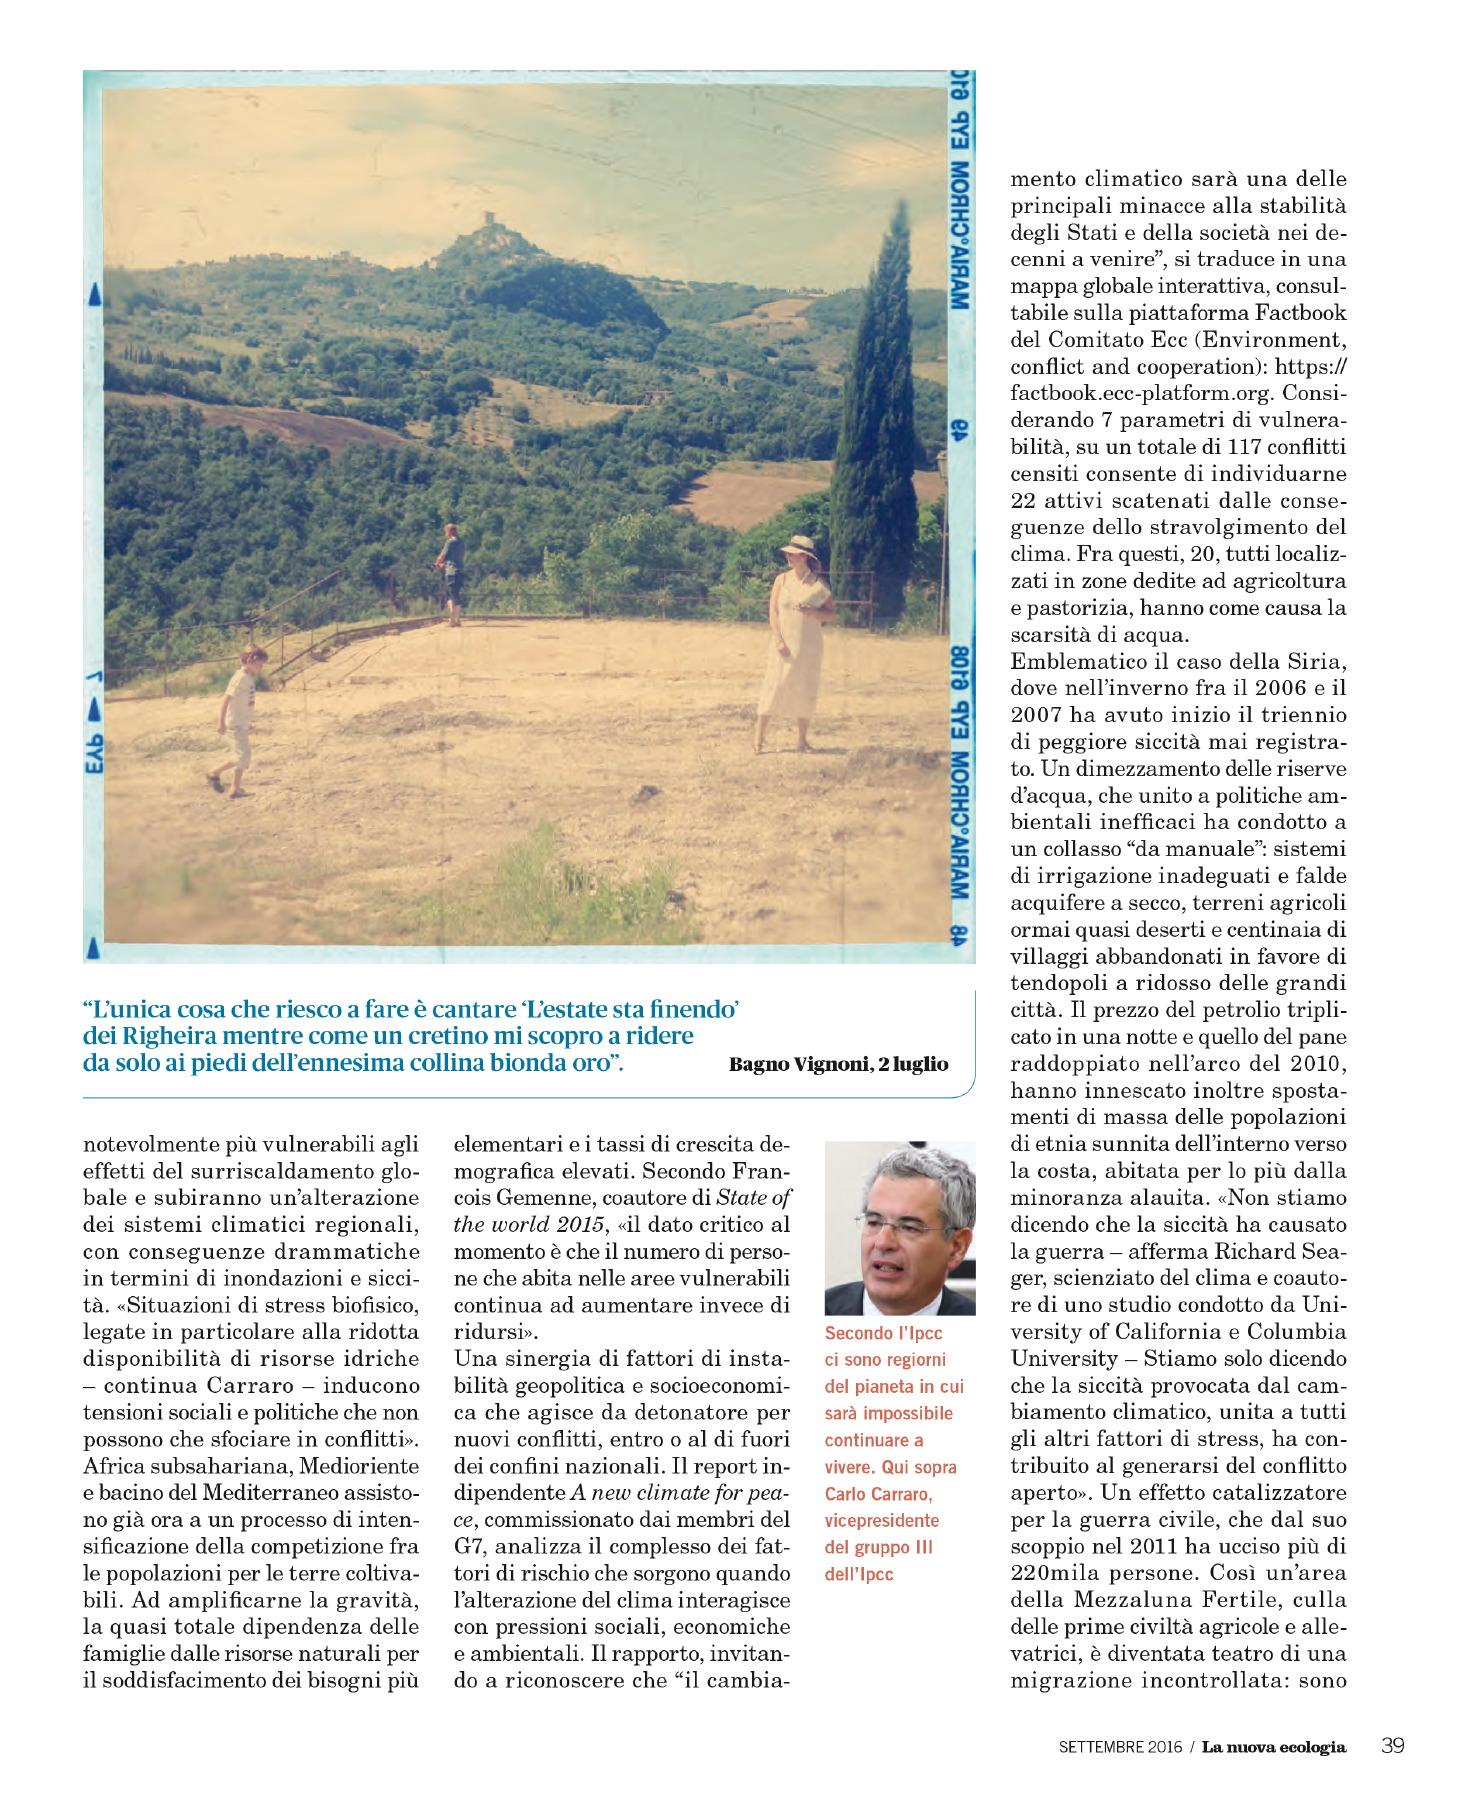 around-the-walk-_-pietro-vertamy-_tearsheet-nuova-ecologia-03